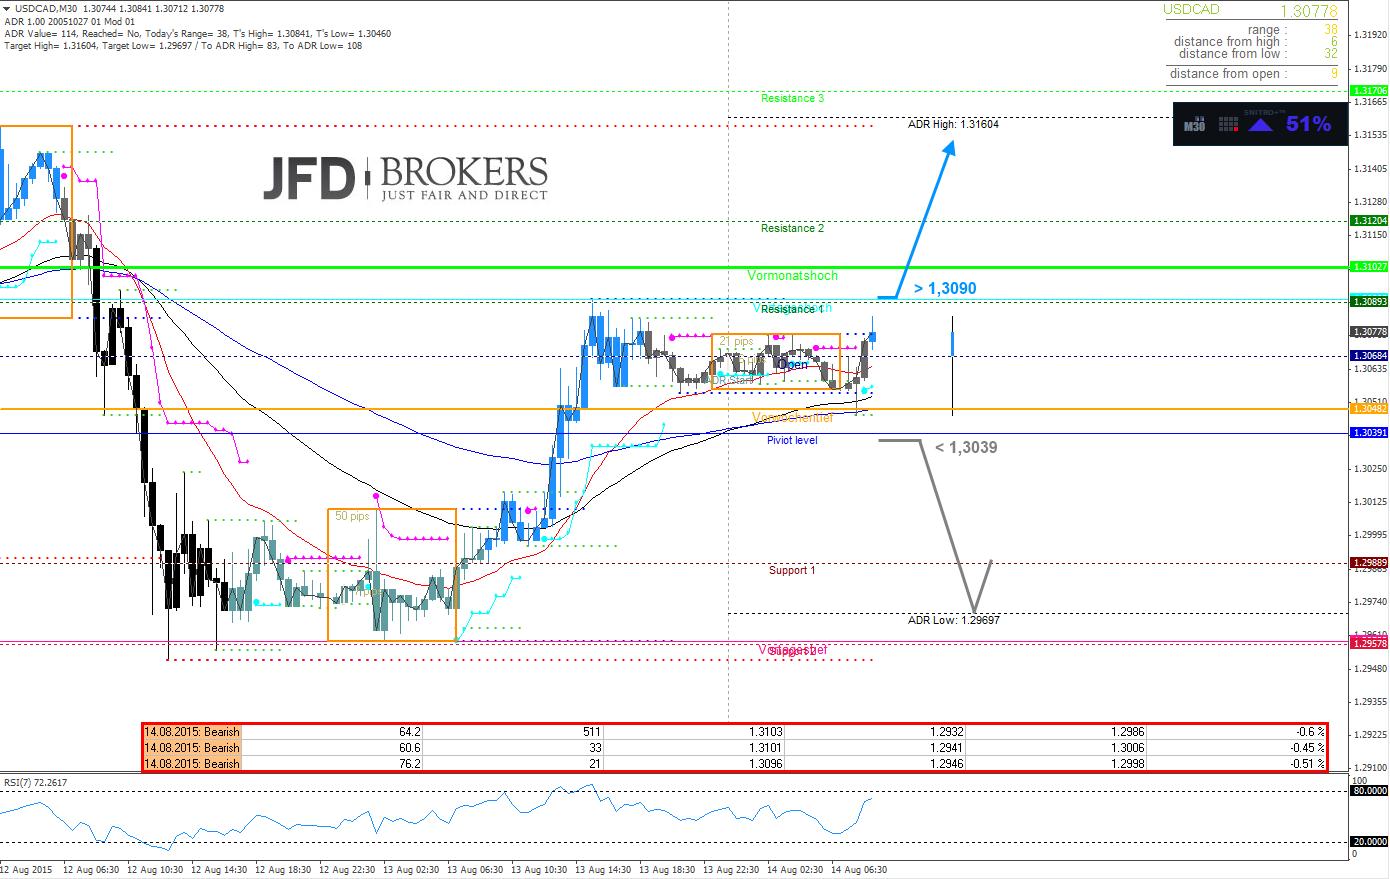 USD-CAD-Intraday-Es-ist-wieder-Loonie-Freitag-Kommentar-JFD-Brokers-GodmodeTrader.de-2